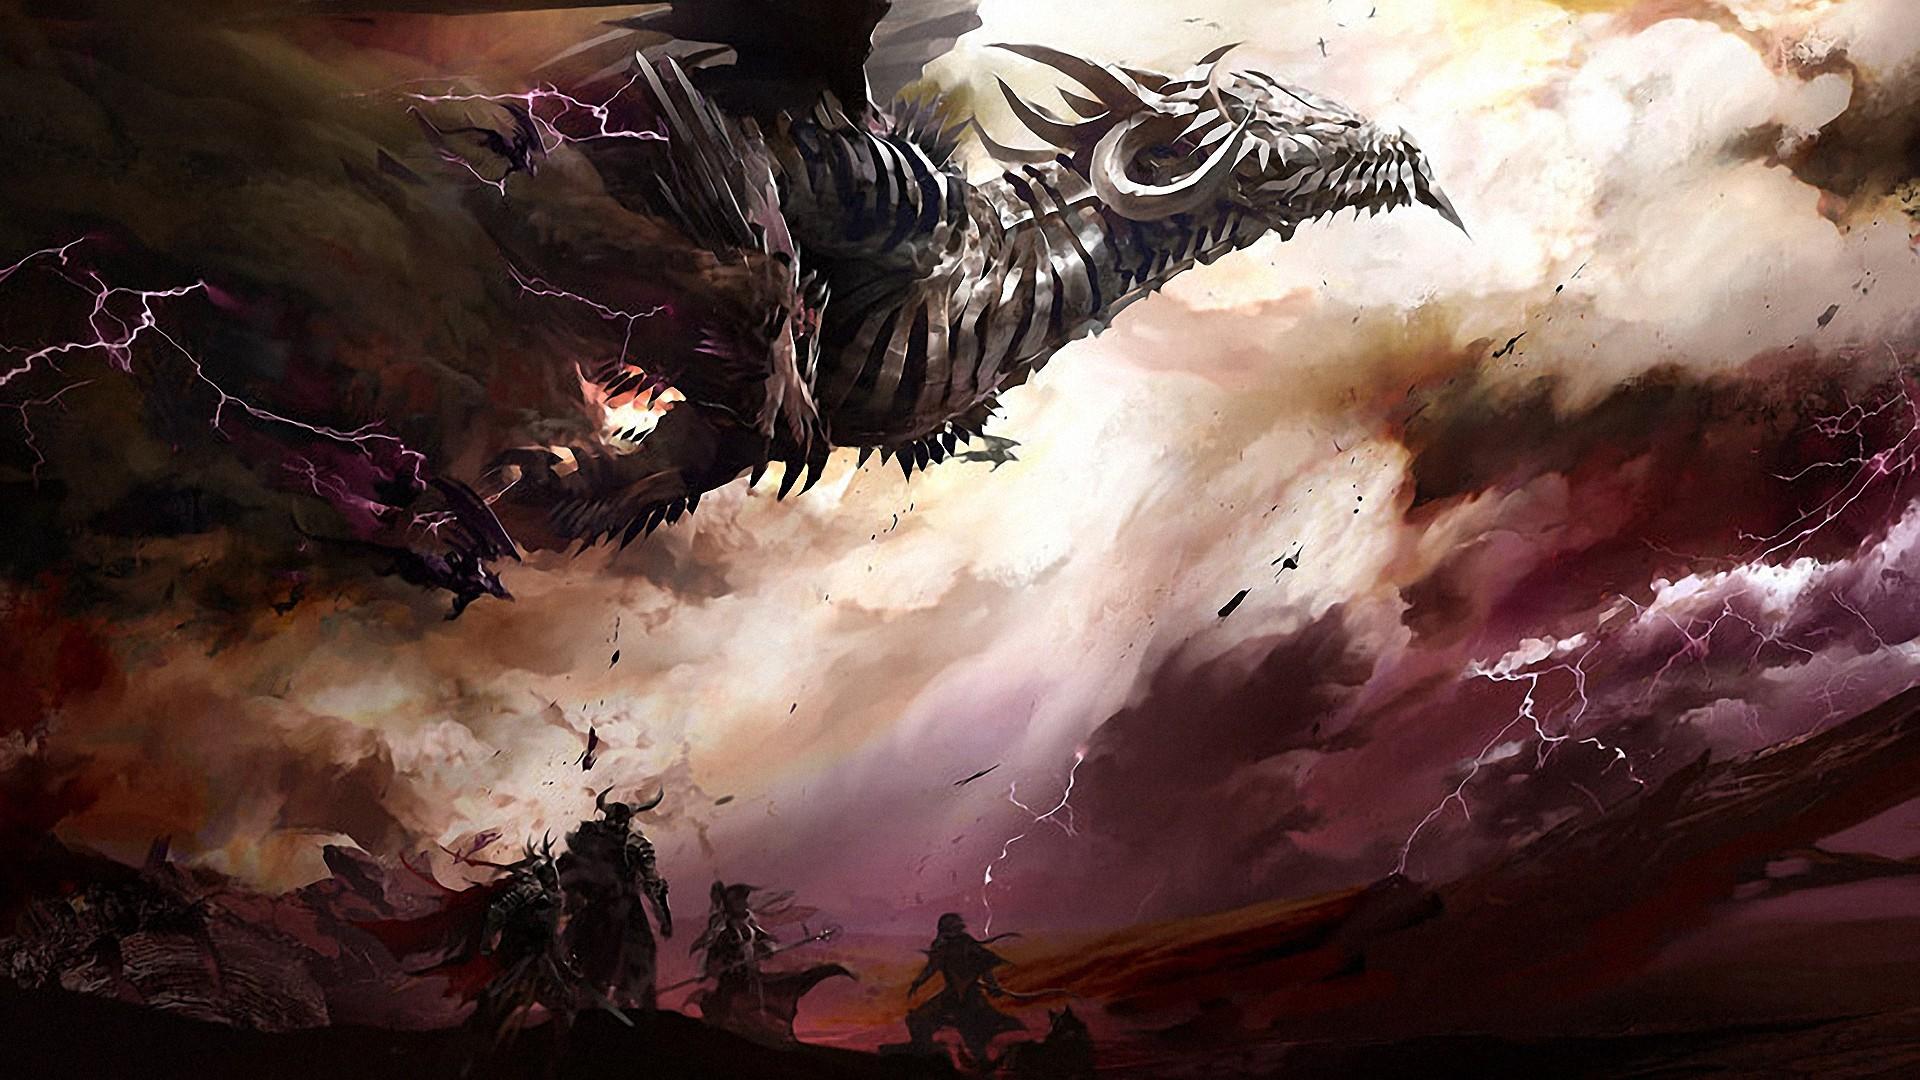 Guild Wars 2 Hd Wallpaper Background Image 1920x1080 Id